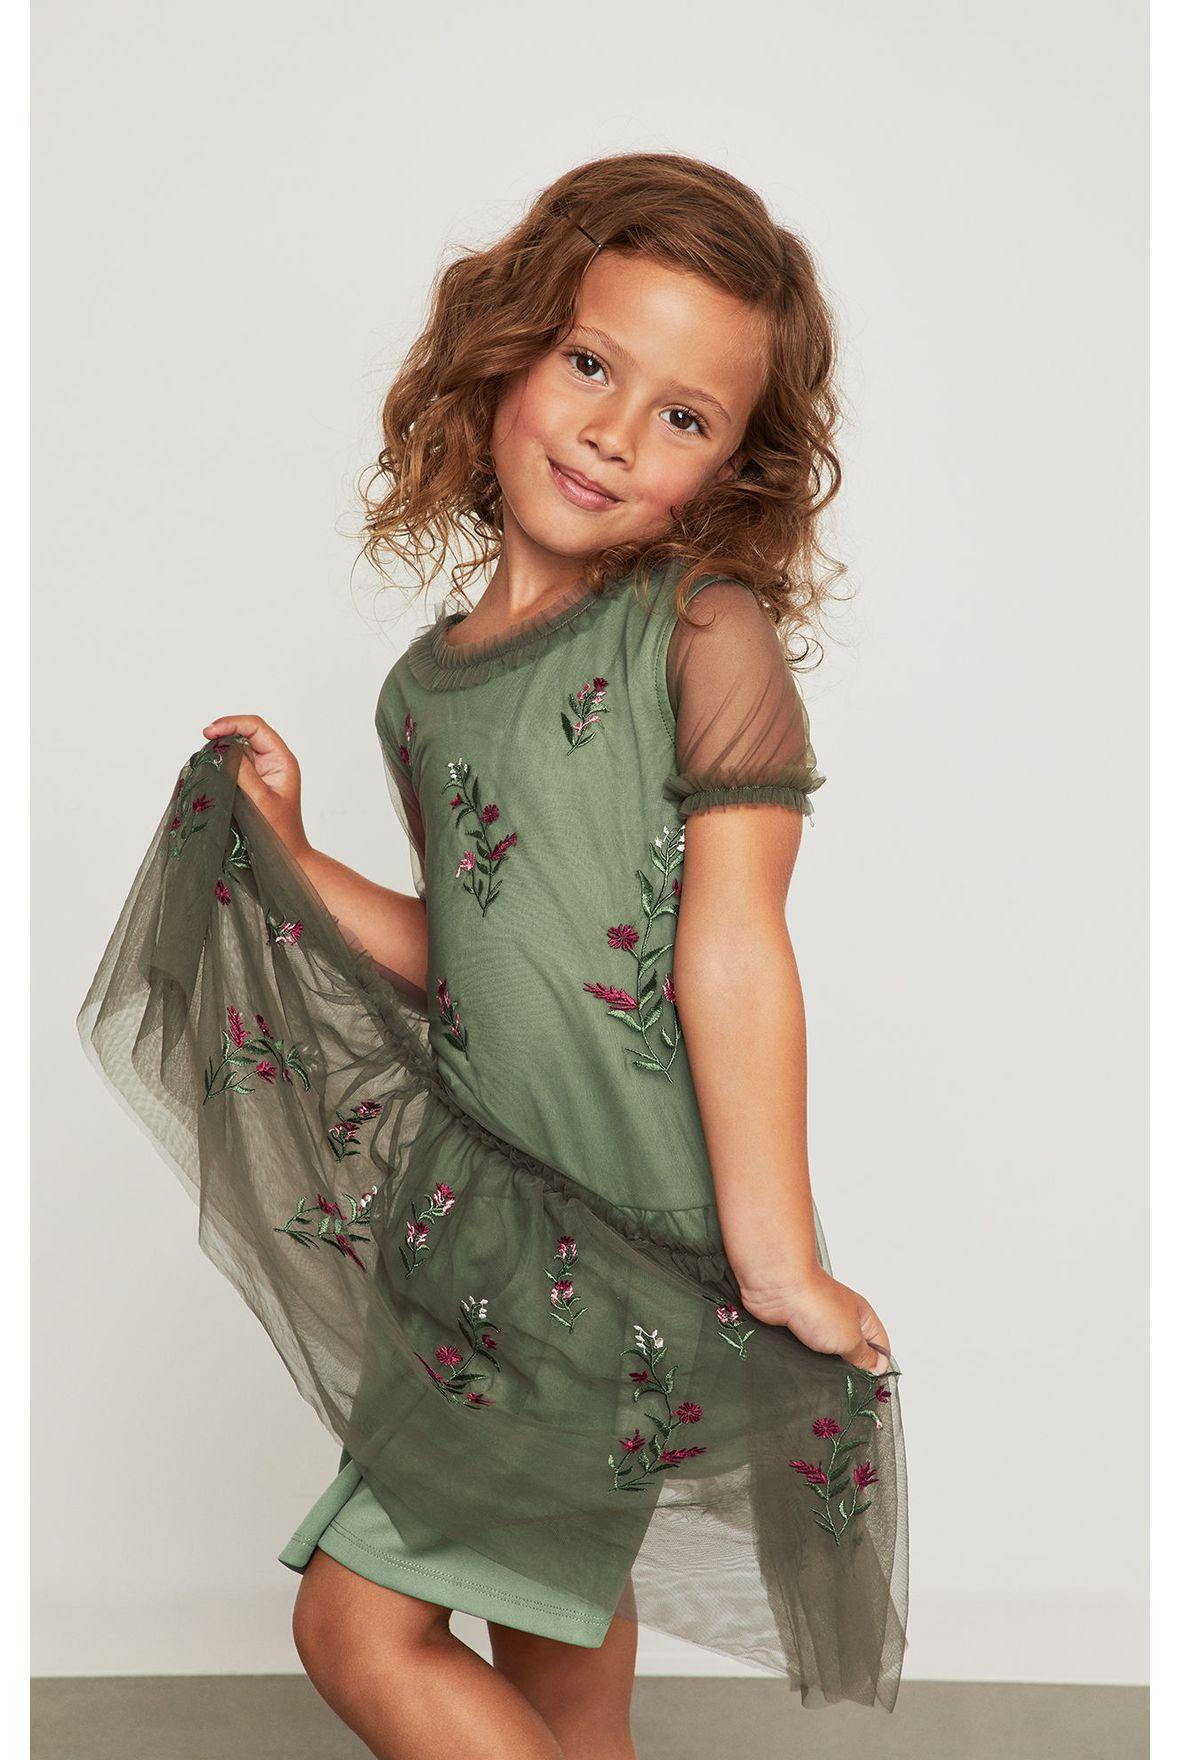 Vestido-BCBGirls-verde-con-flores-B638DR206_DOL